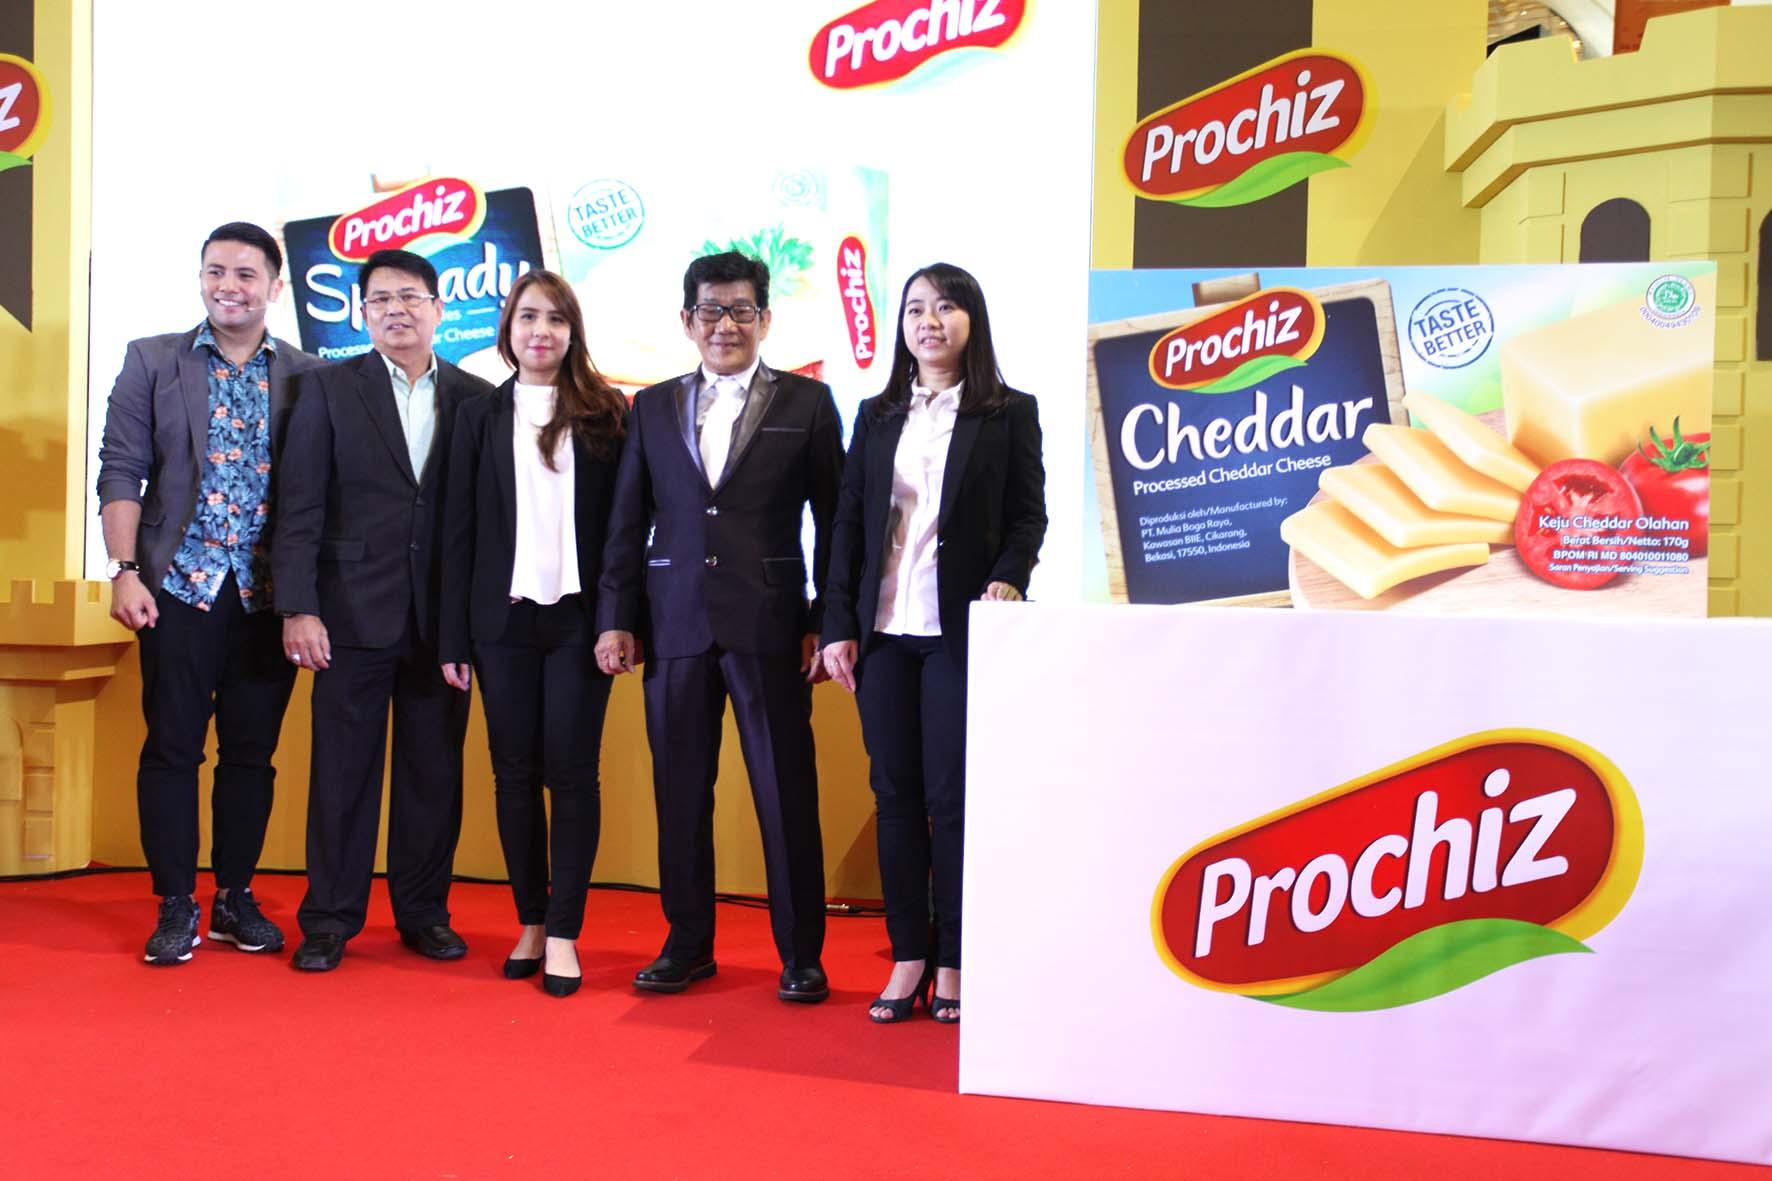 Prochiz Vaganza Ajak Masyarakat Hobi Makan Keju